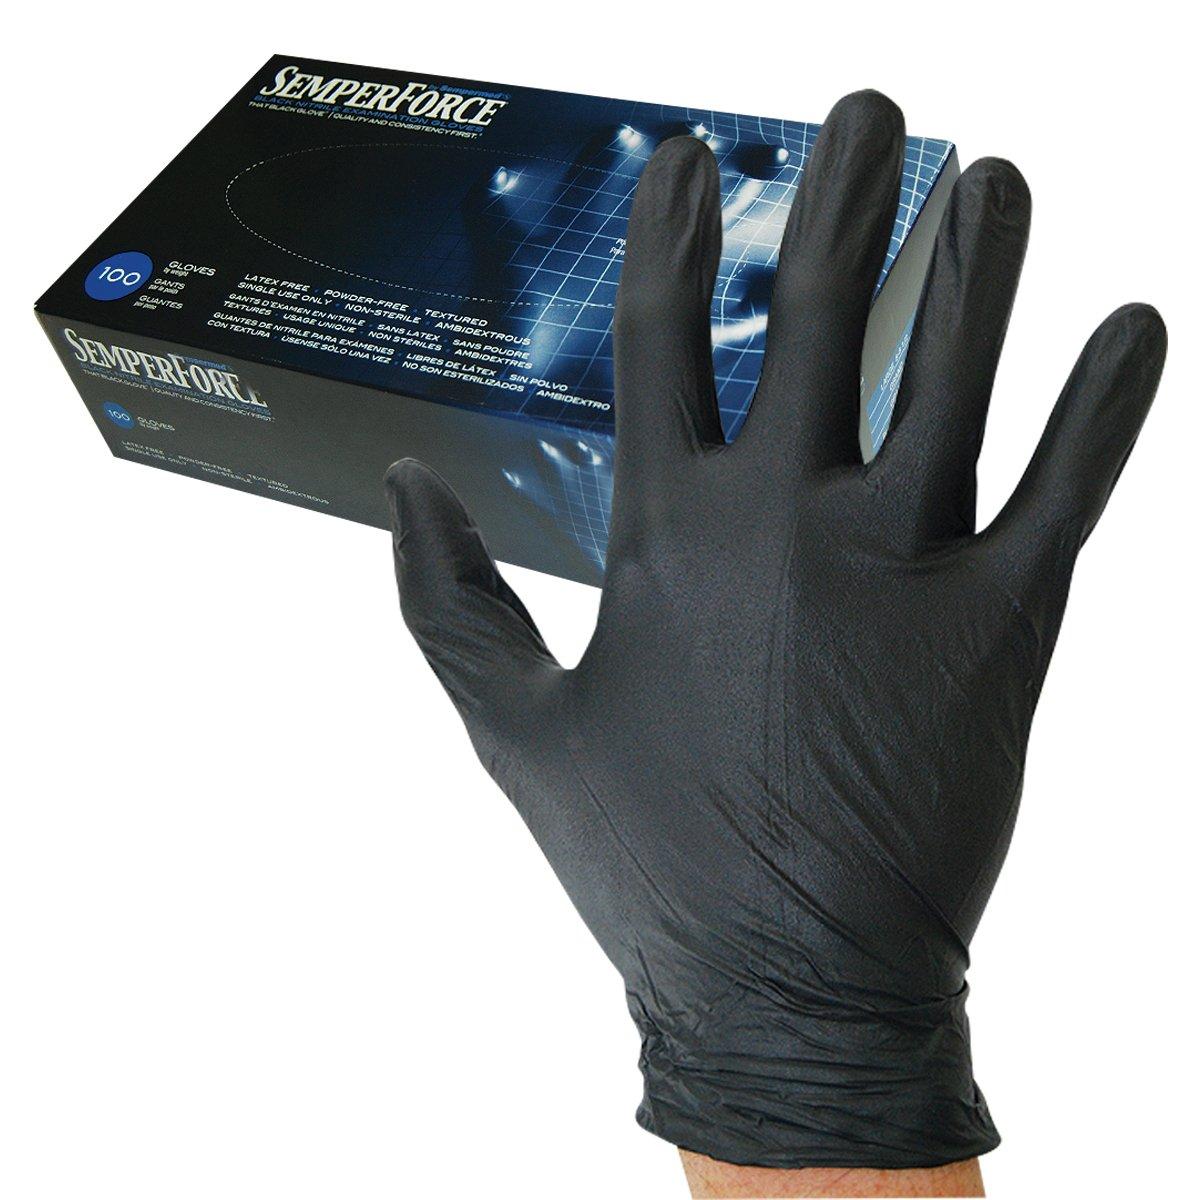 Sempermed Semperforce Black Nitrile Glove-XL-Box/100, X-Large